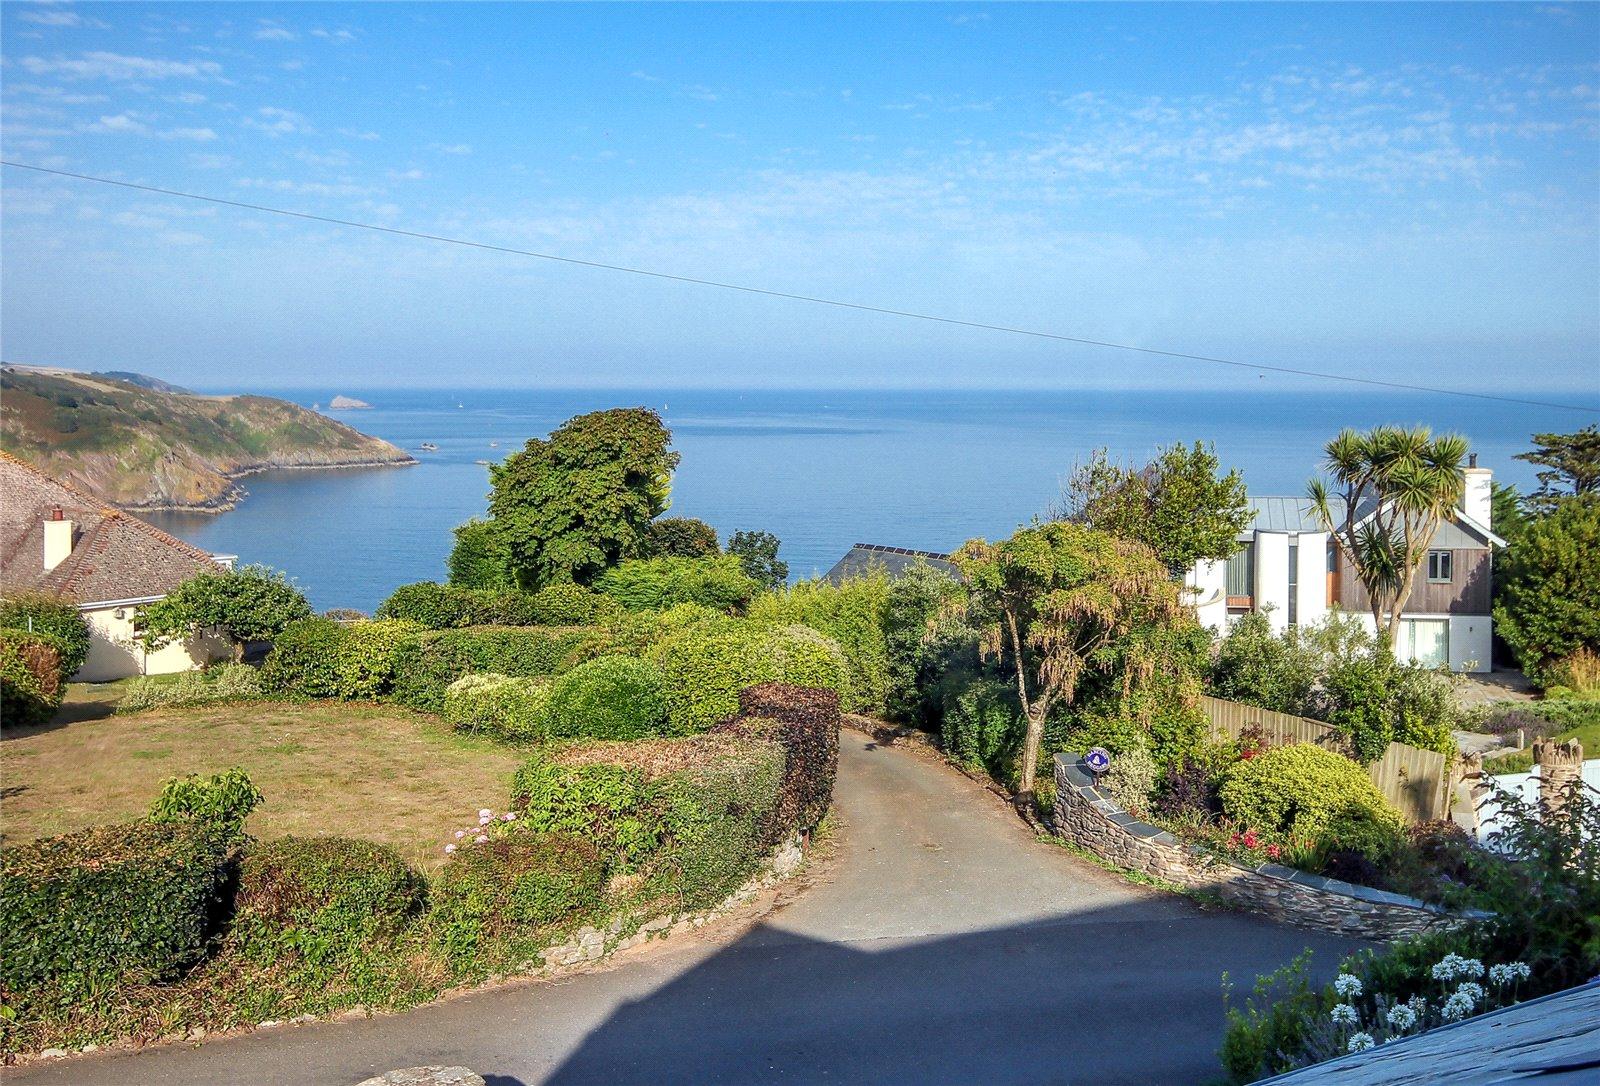 6 Bedroom Property For Sale In Mewstone Overseas Estate Stoke